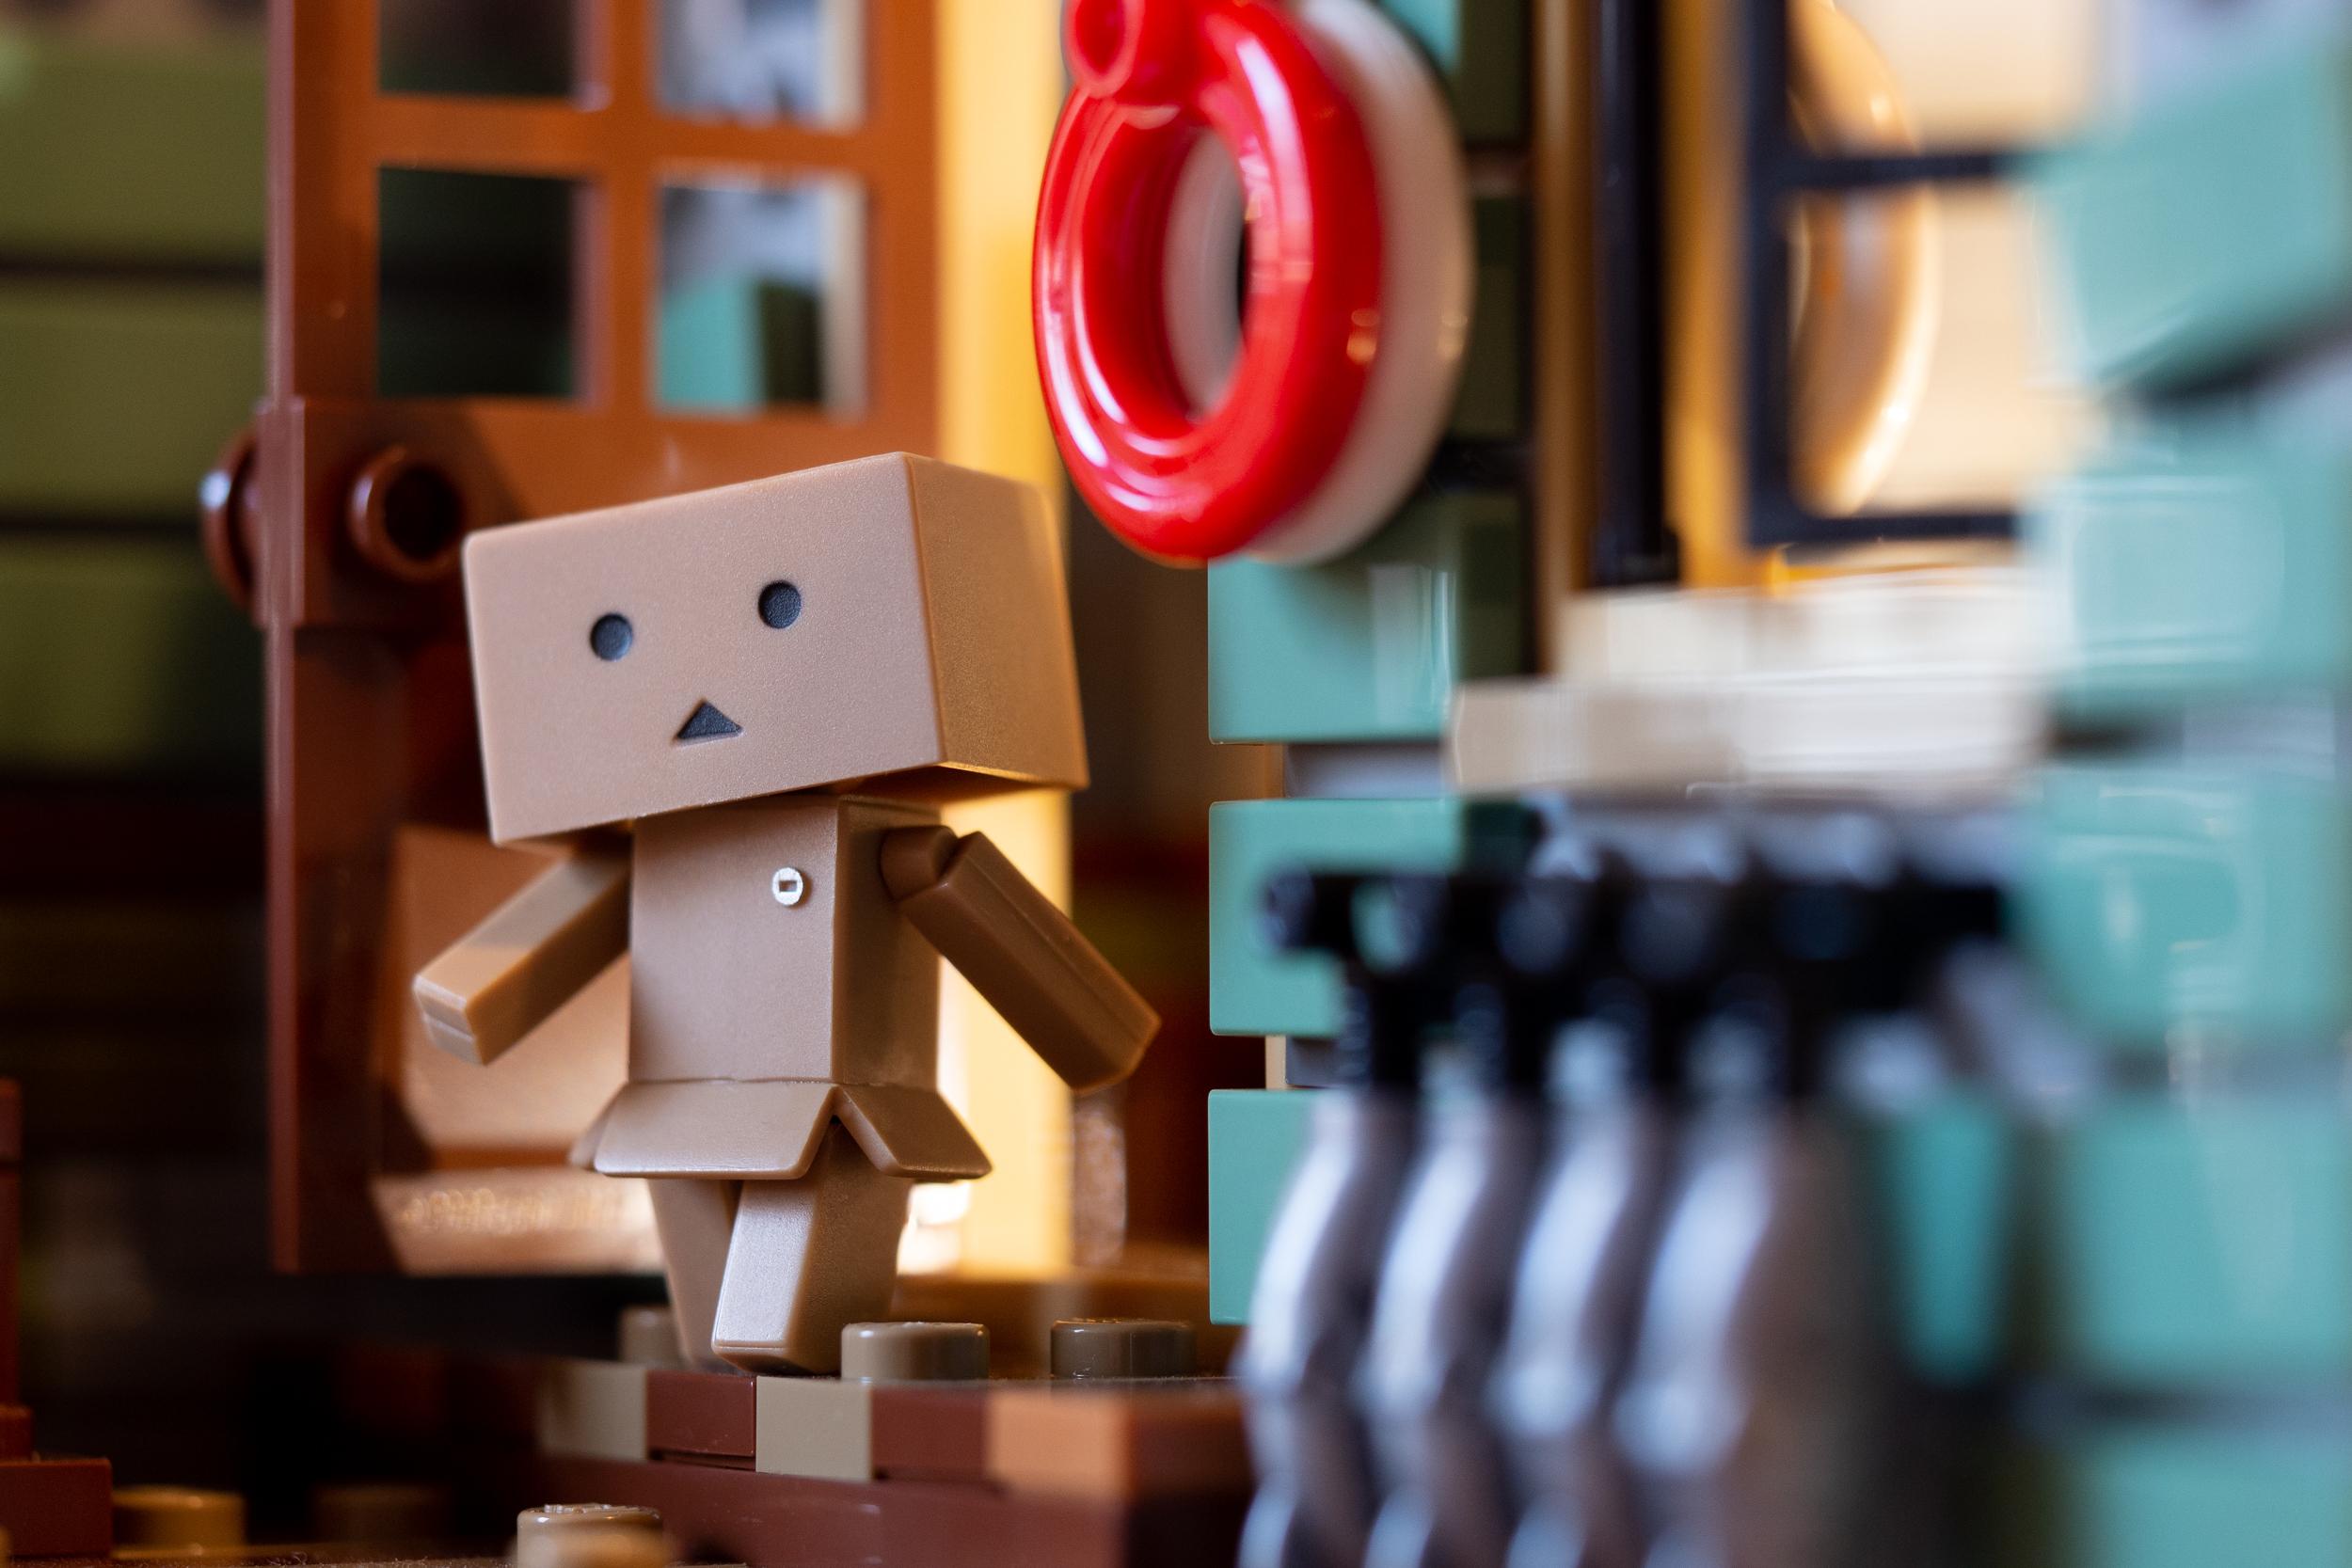 mini_danbo_lego_fishing_store_leila_chieko.jpg